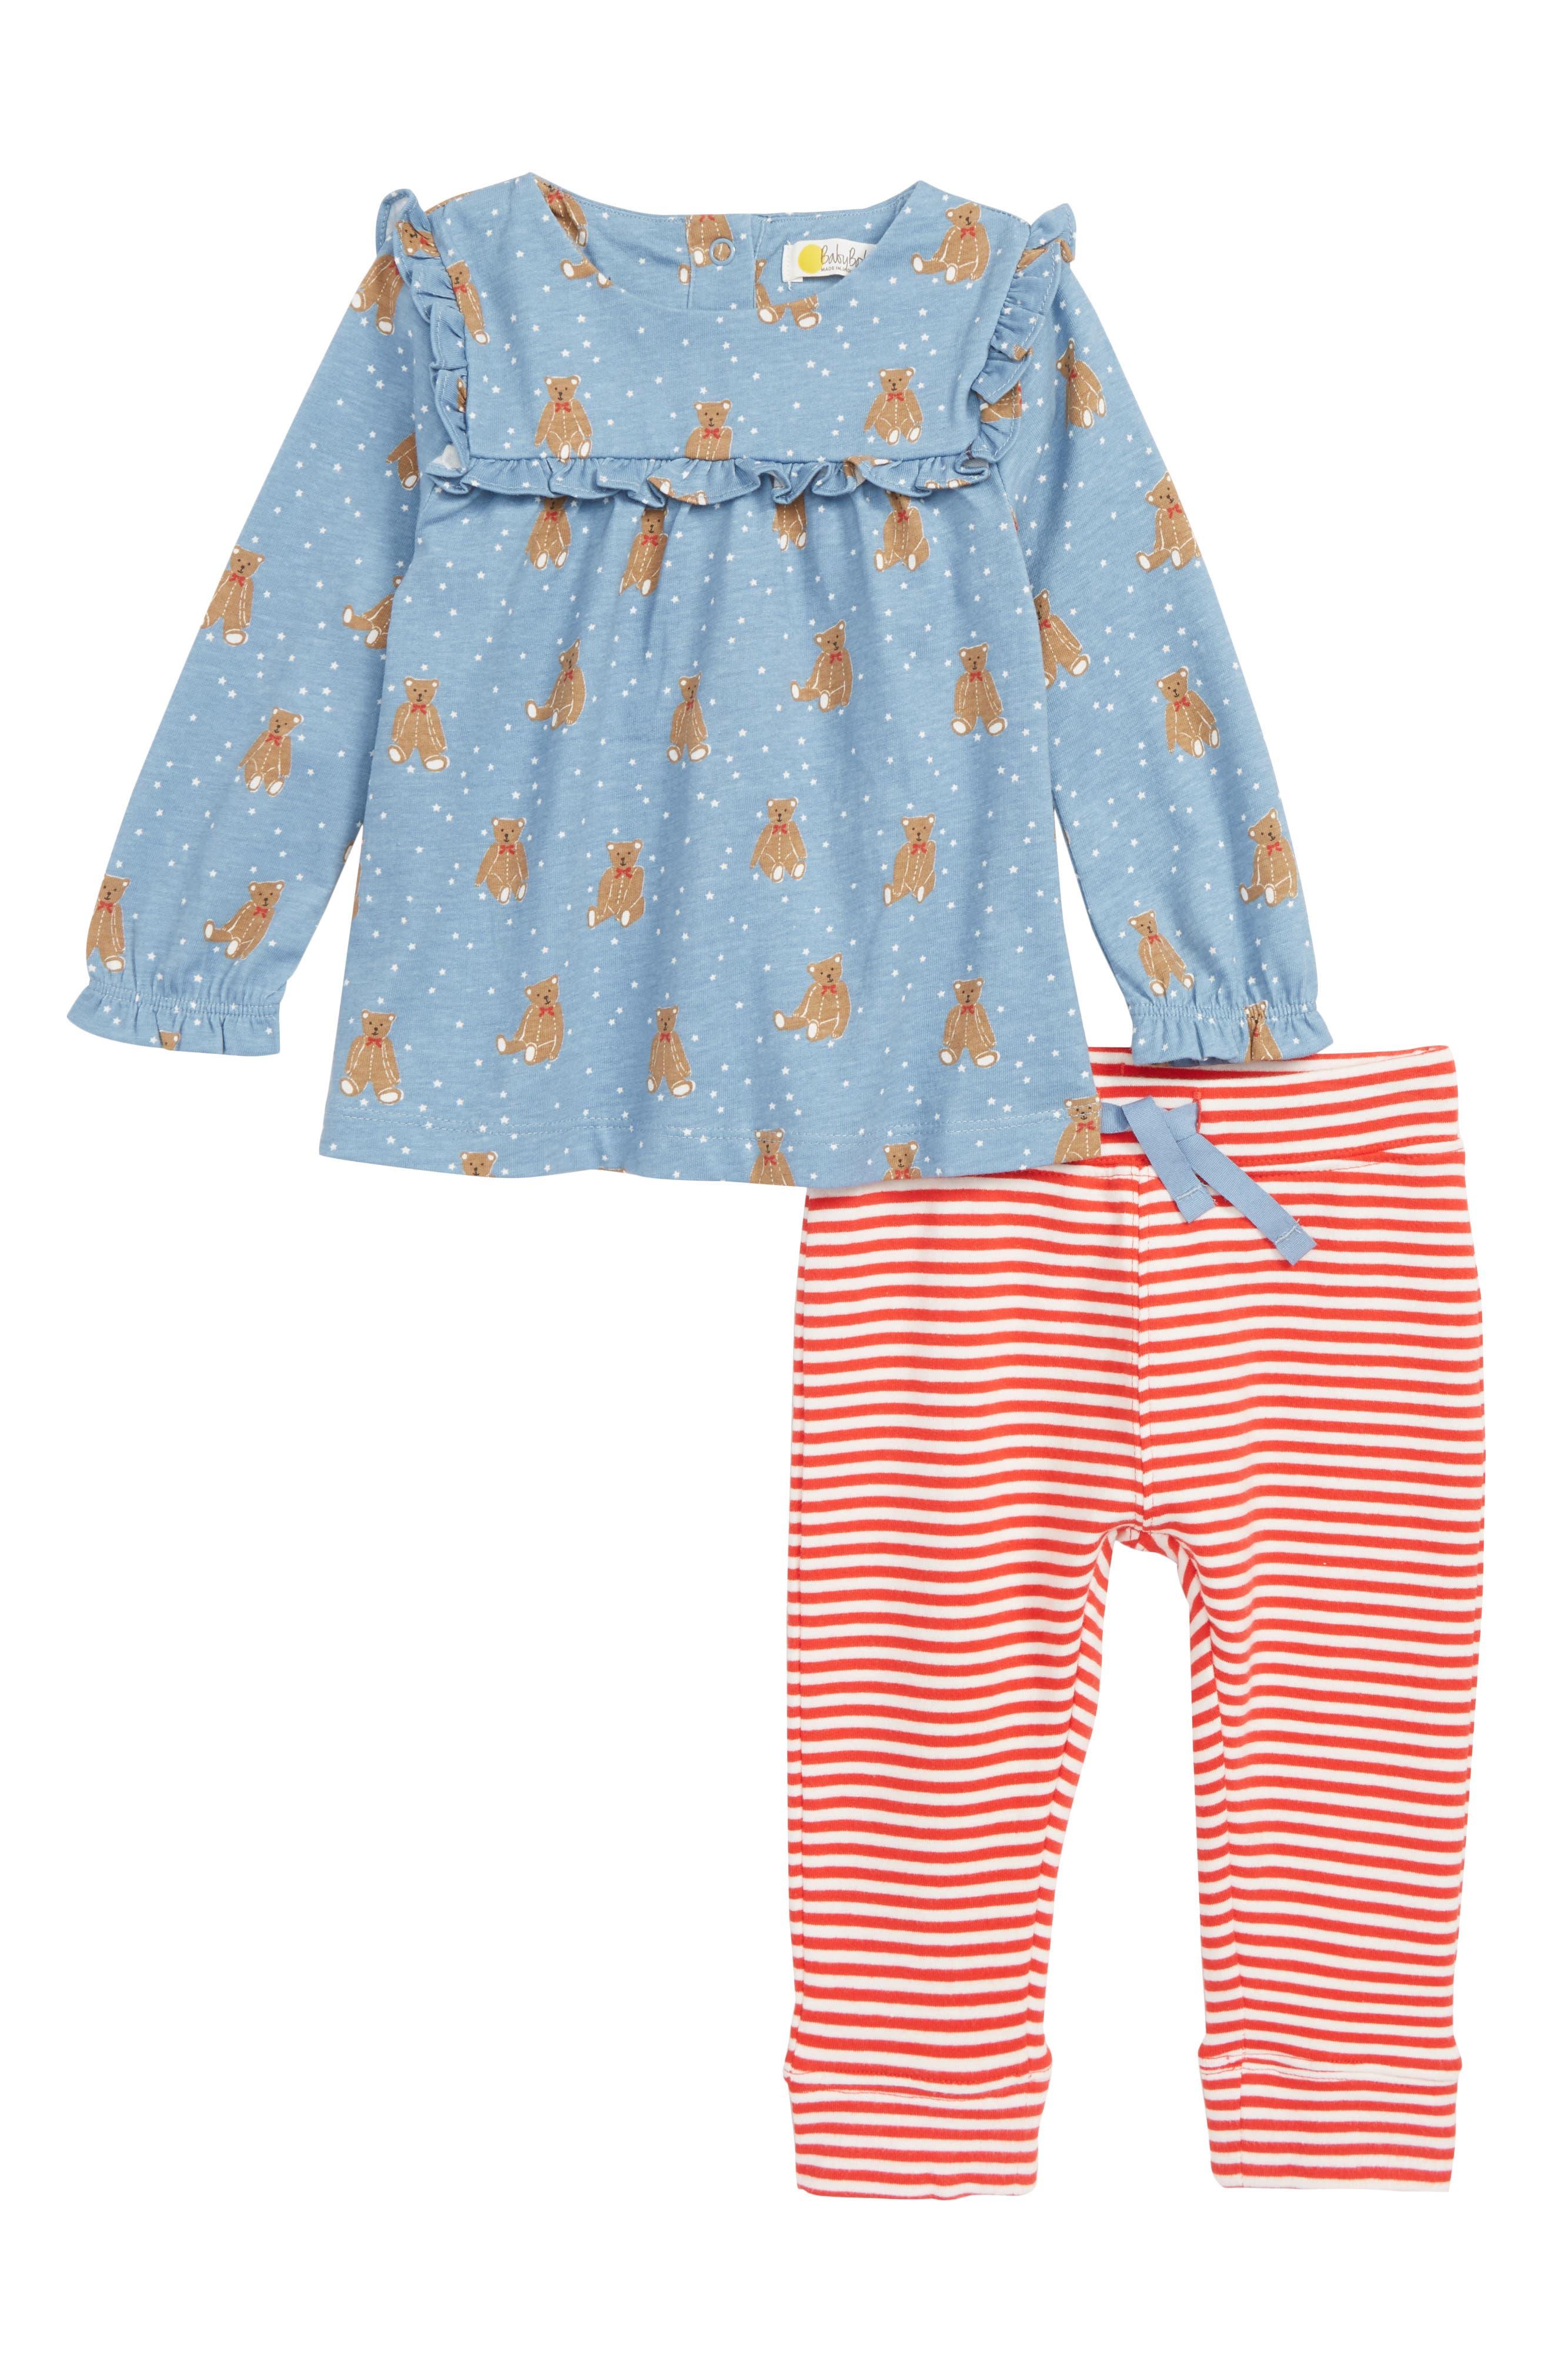 MINI BODEN Boathouse Blue Baby Bars Tunic & Leggings Set, Main, color, 400